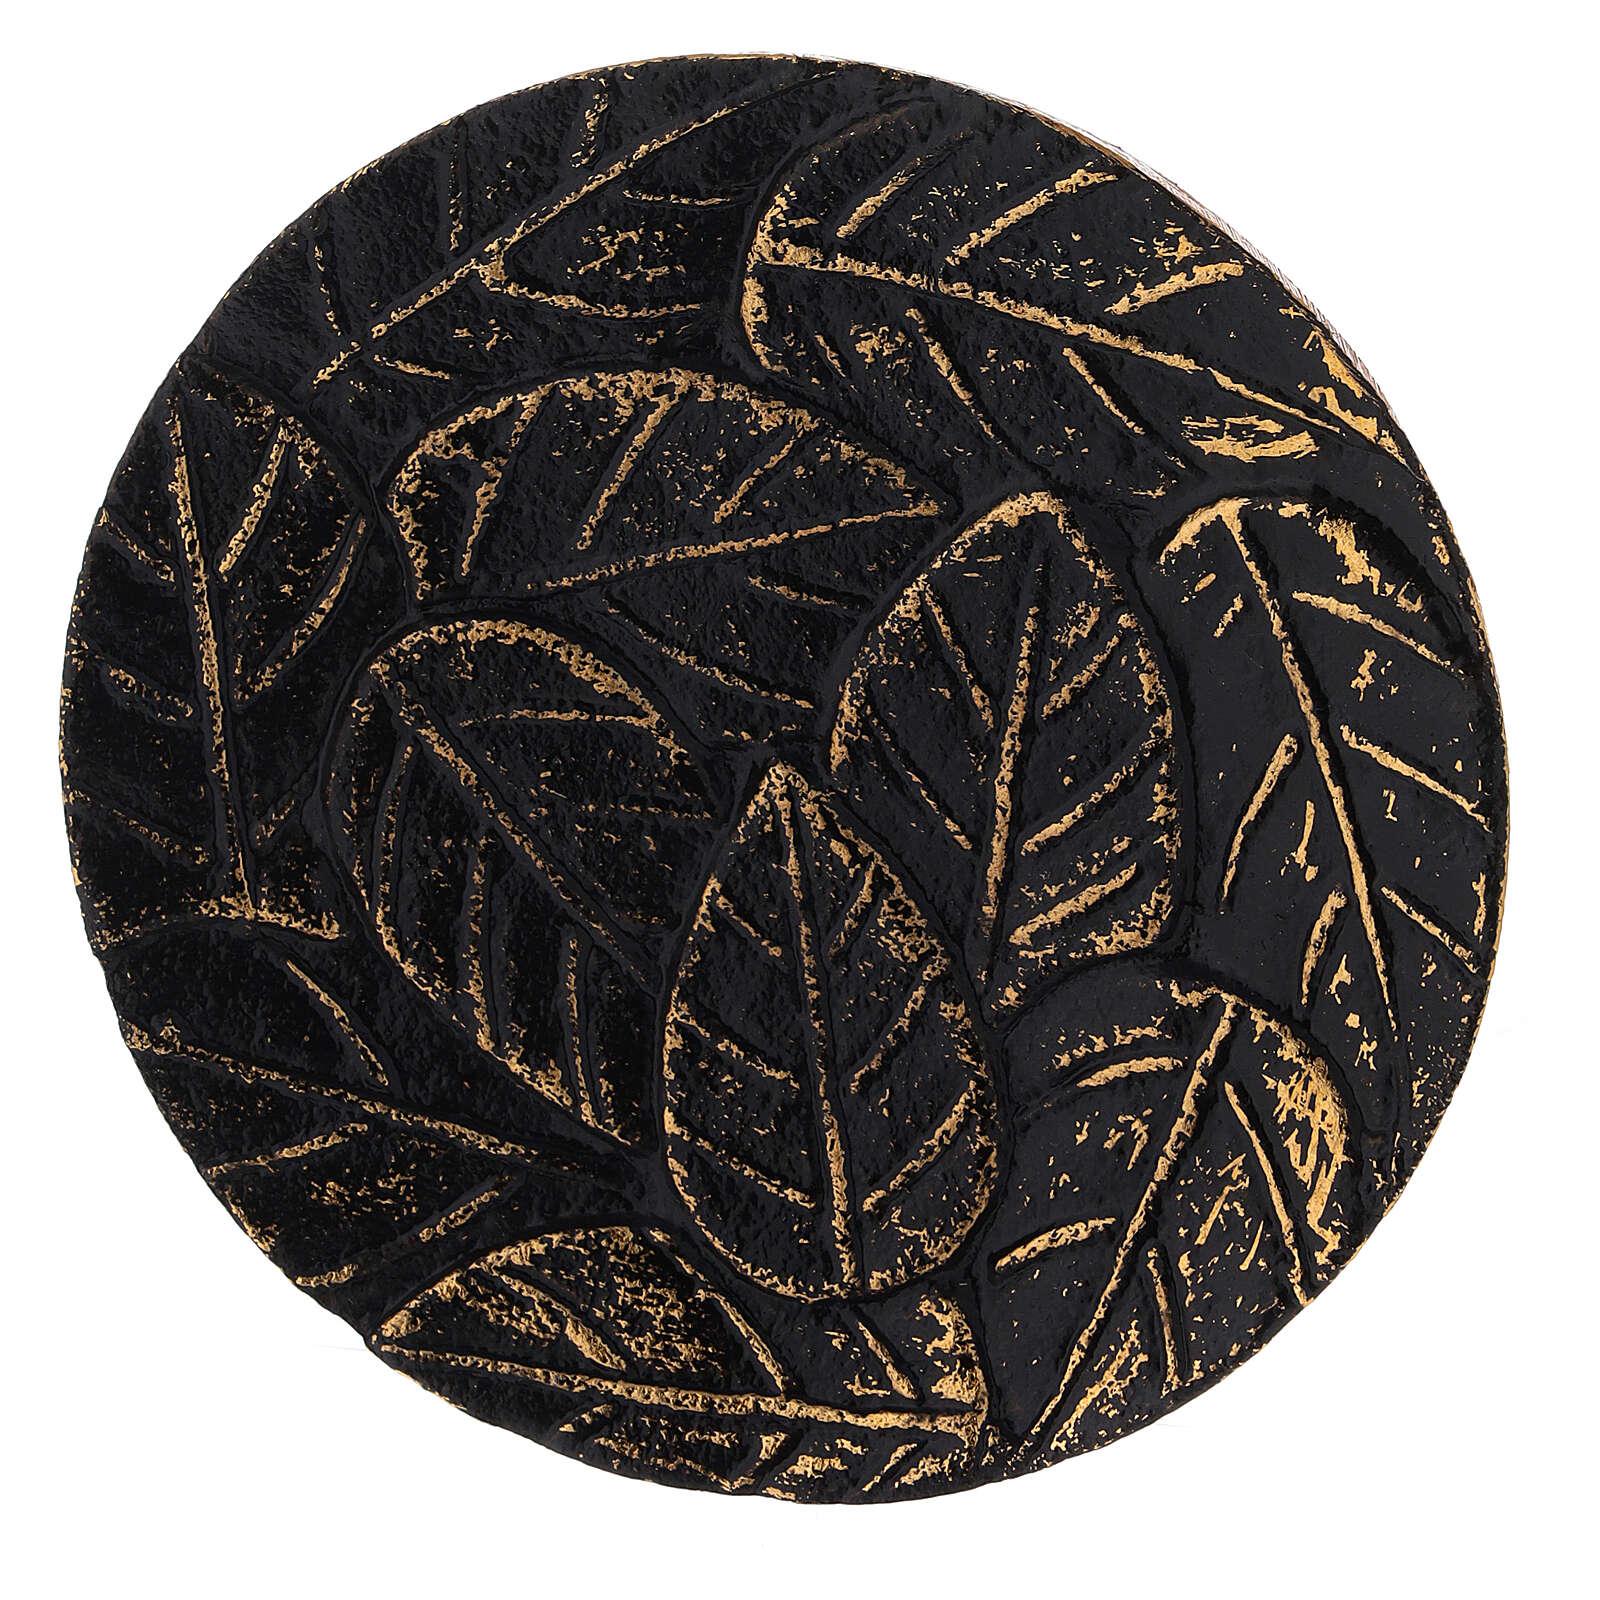 Plato para vela aluminio negro oro motivo hojas d, 12 cm 3